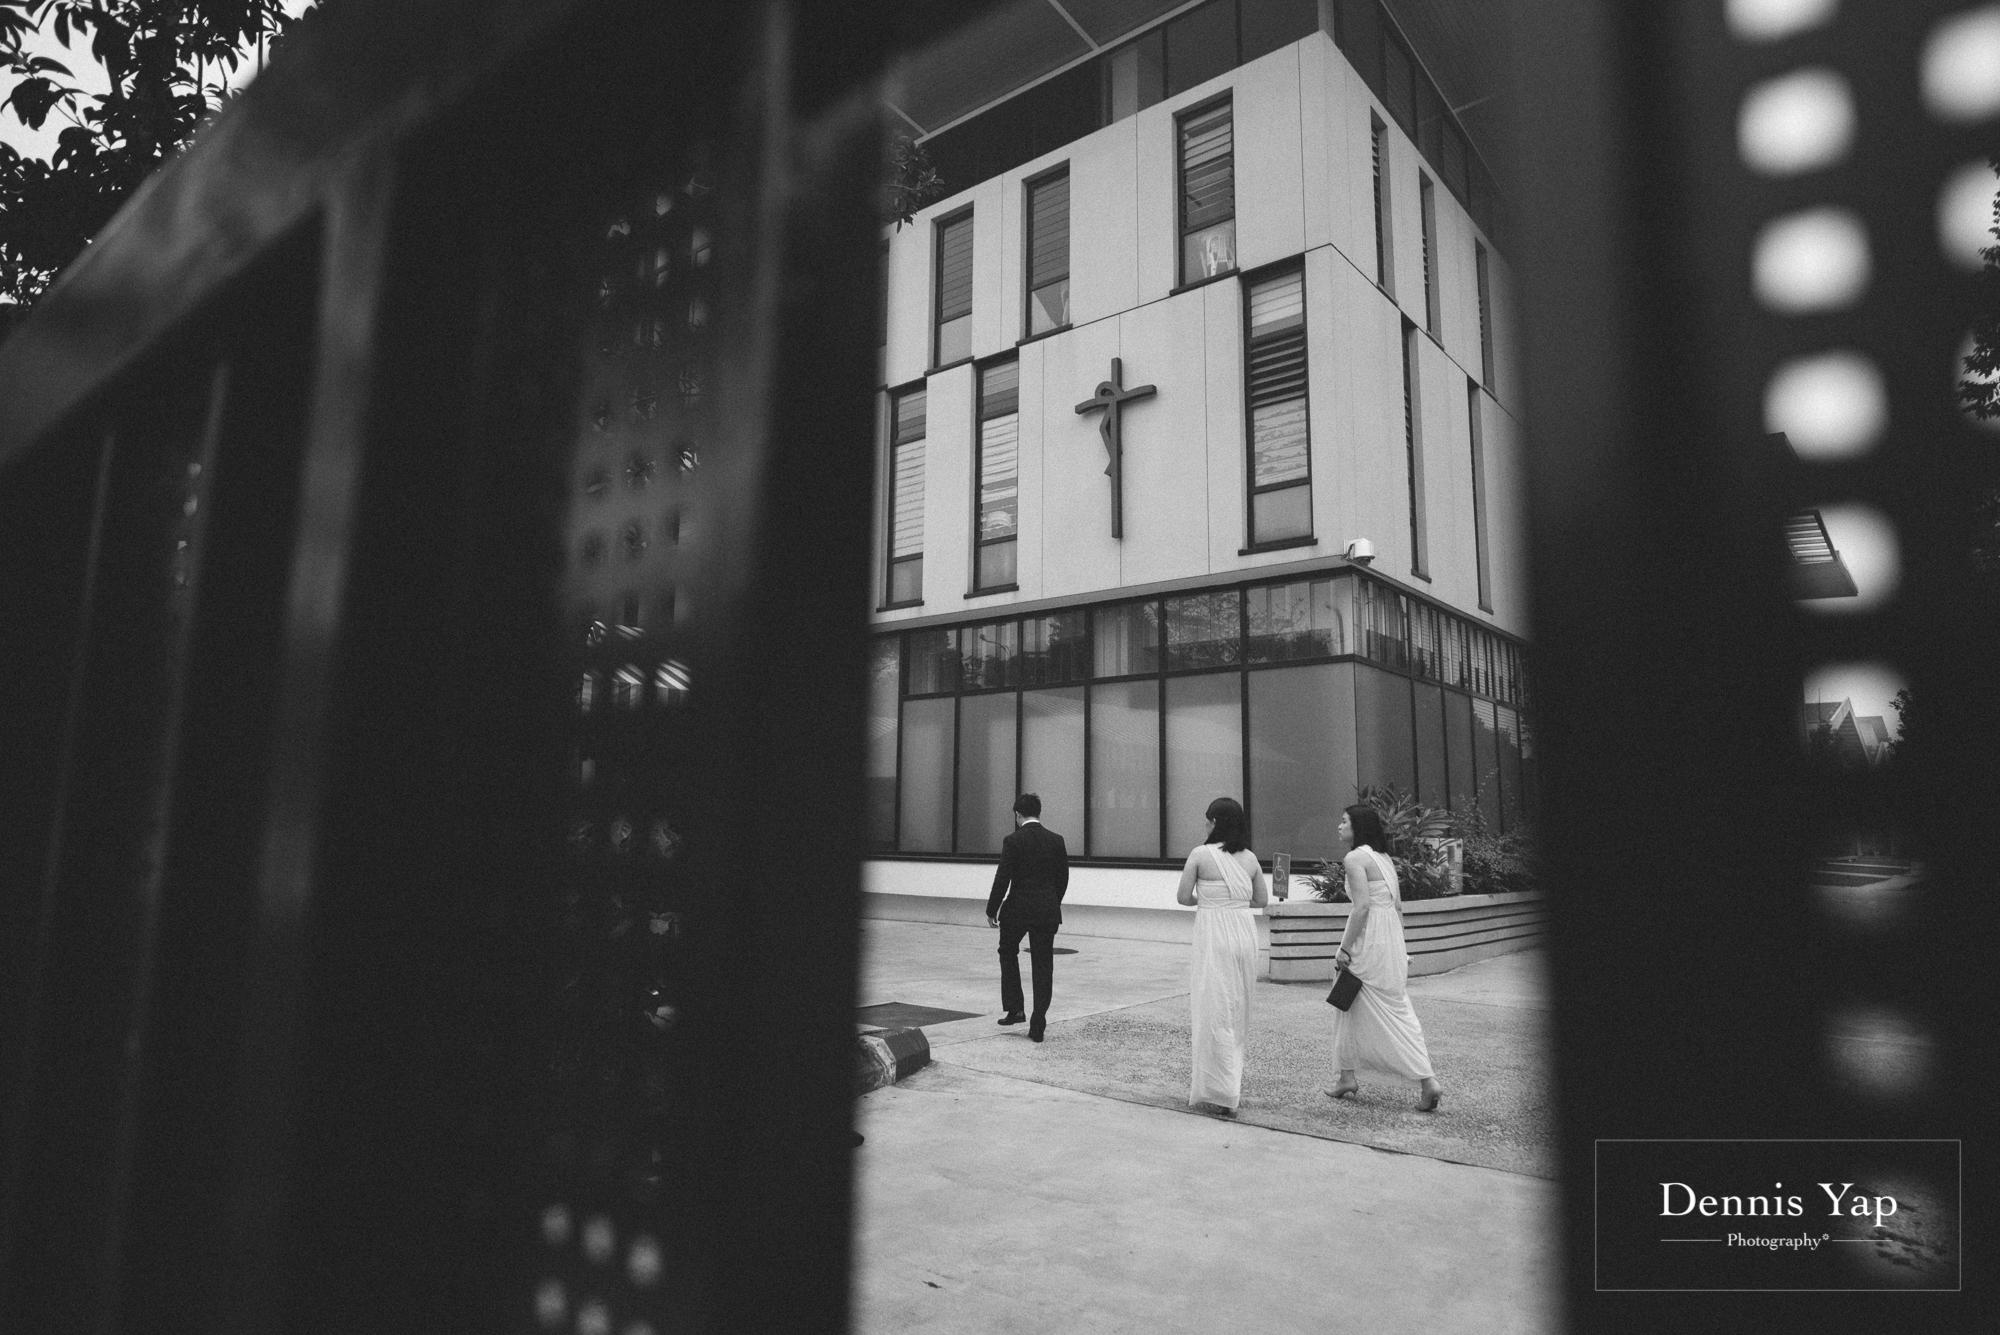 ino sheri black white church wedding st thomas more subang jaya dennis yap photography touching love beloved australia indonesia-23.jpg